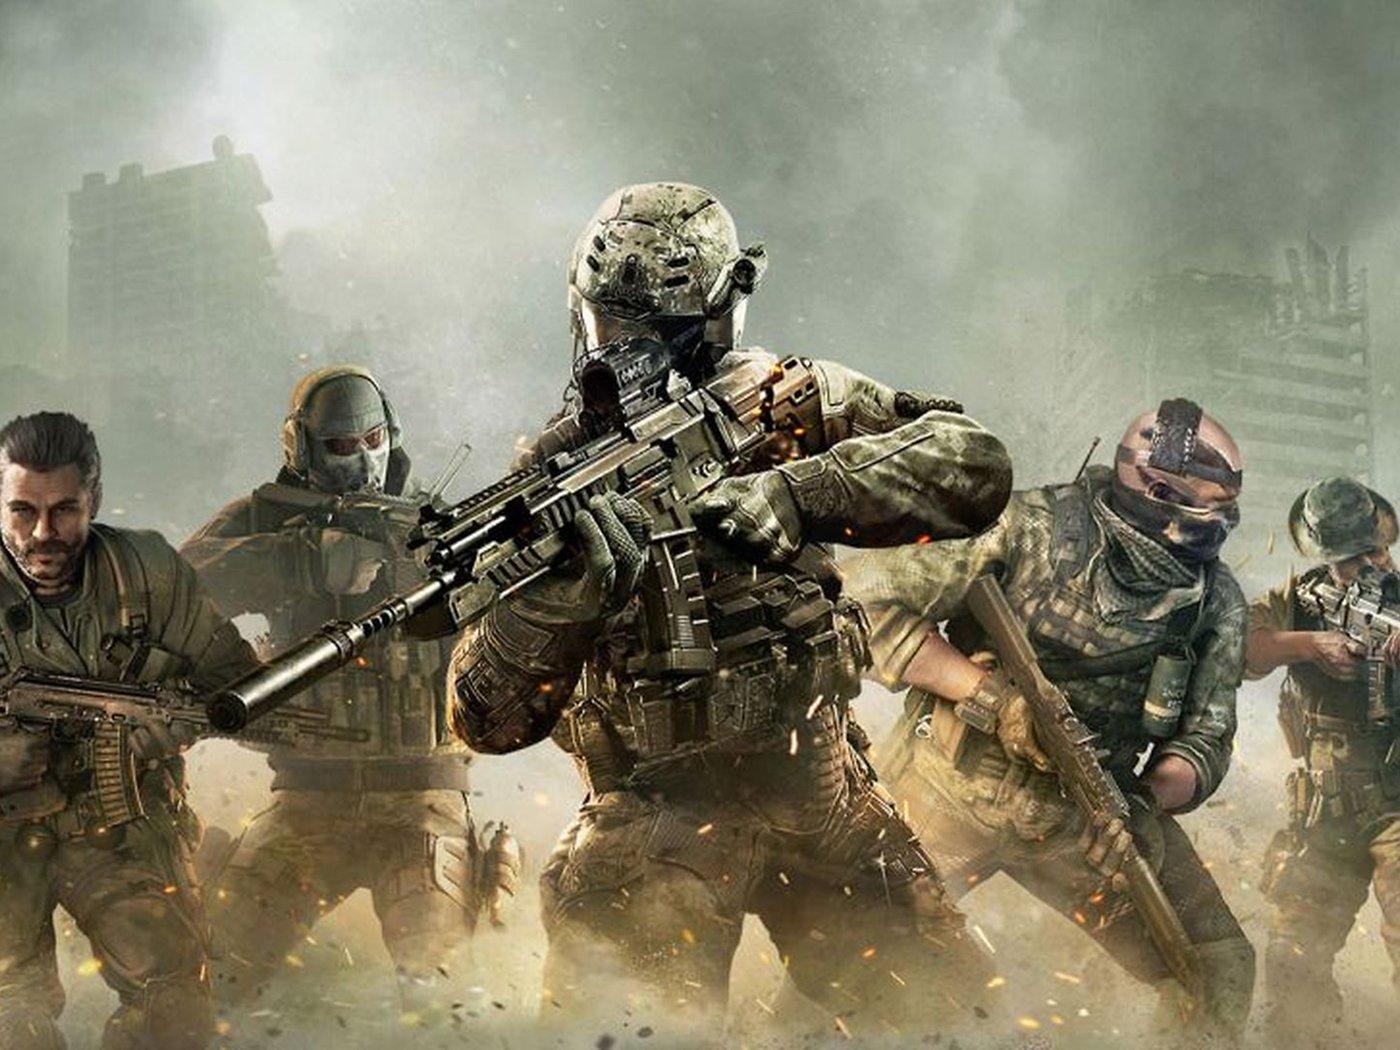 jugar Call of Duty Mobile en PC